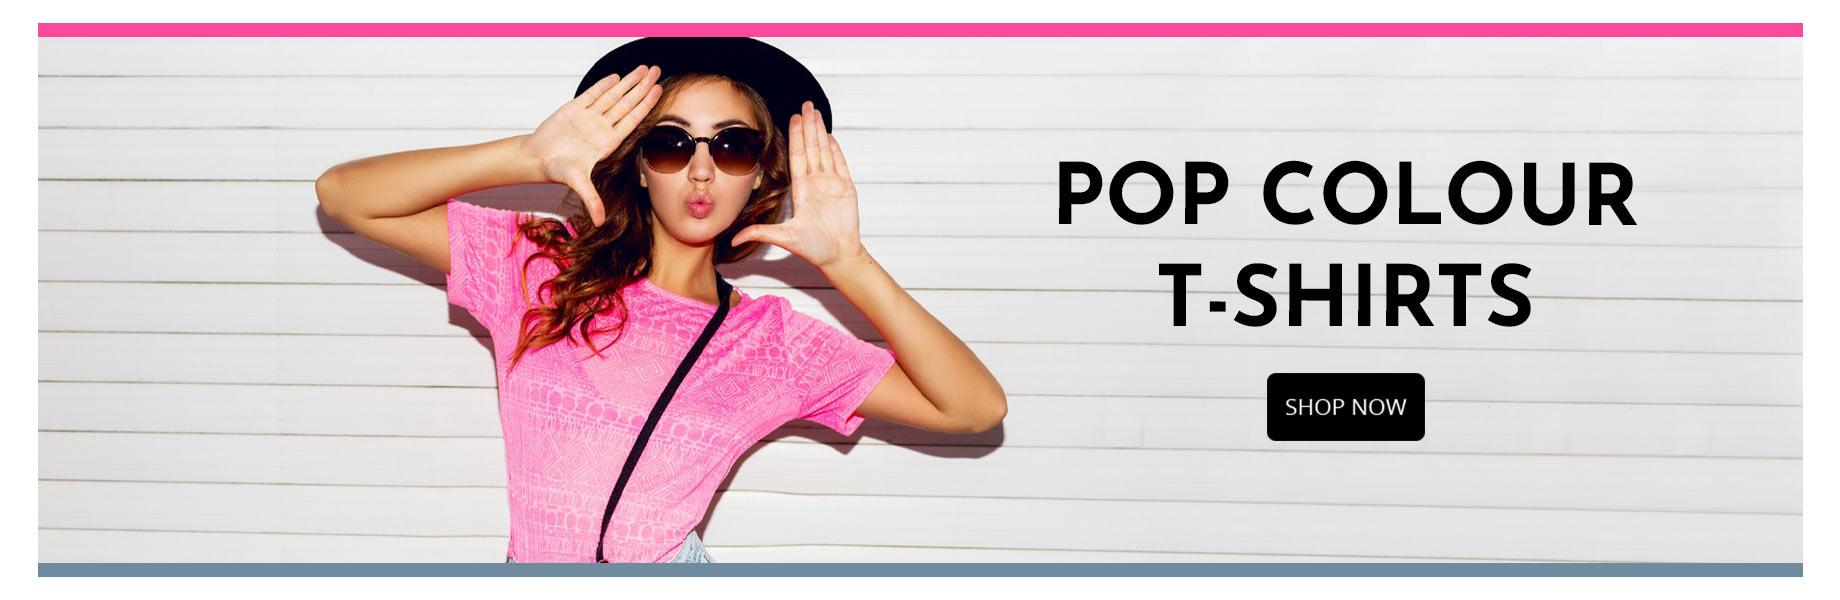 Tshirt-Fest-Women-Pop